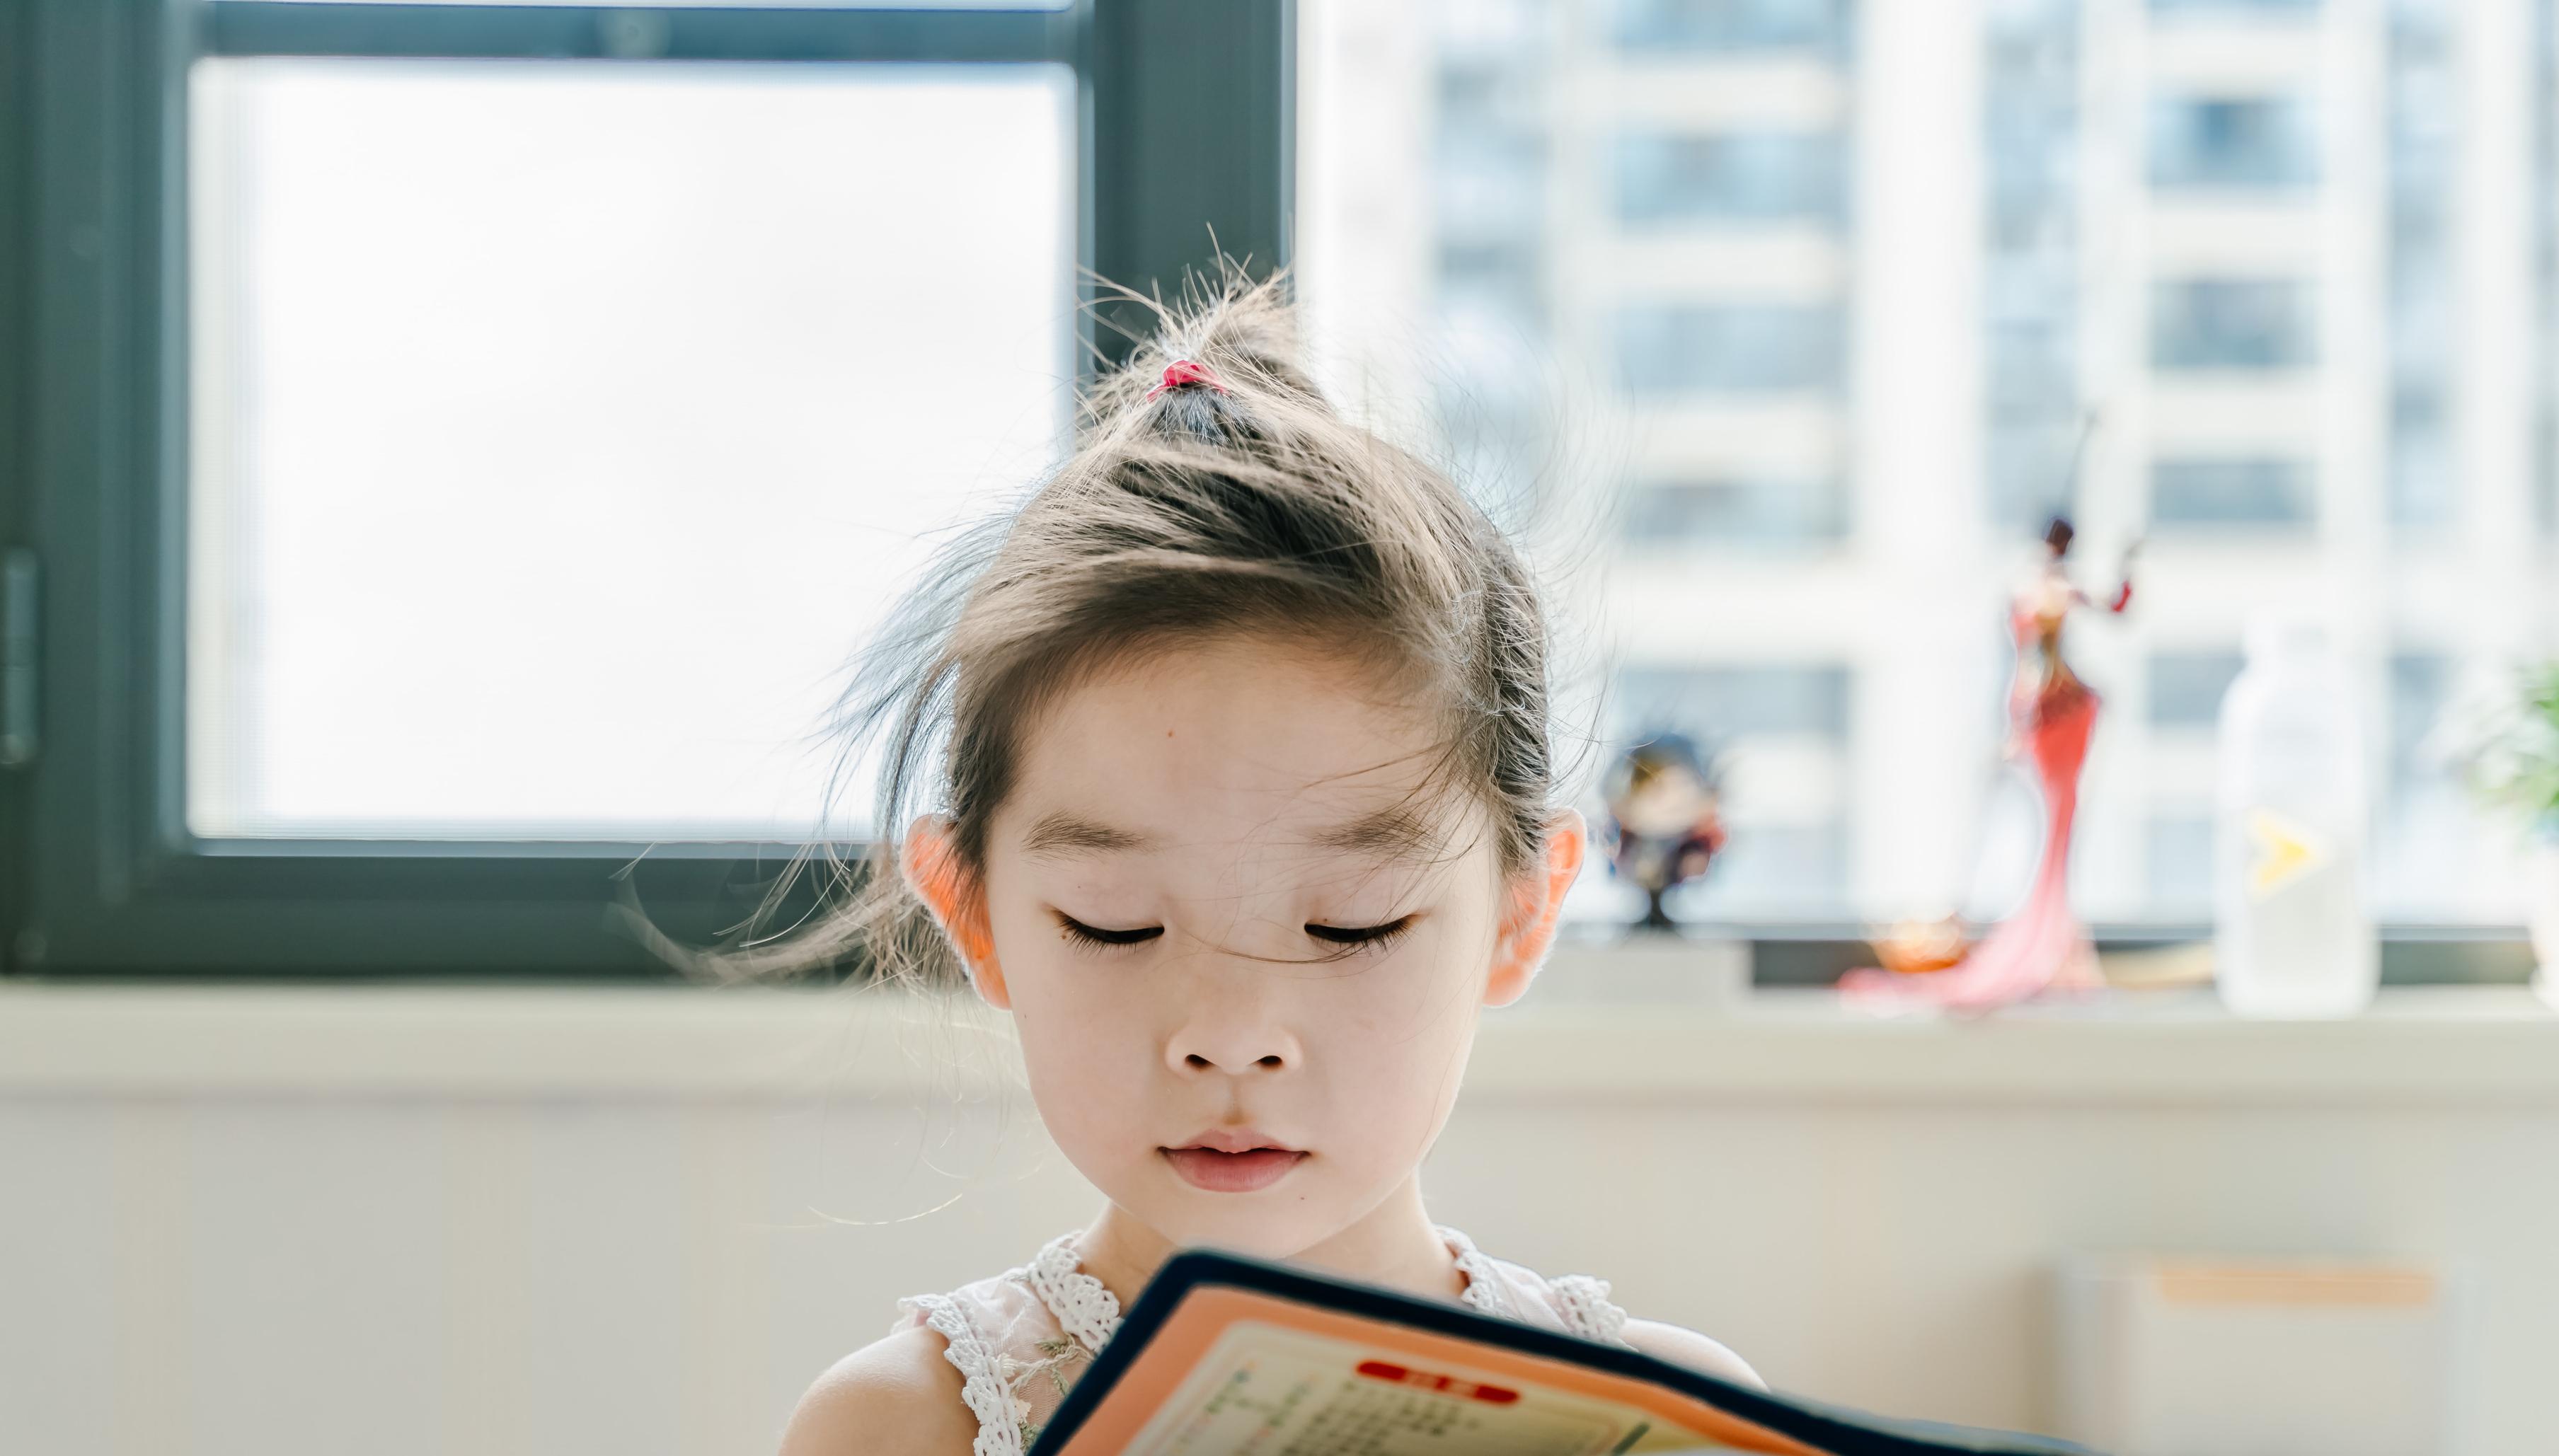 A child reads a book.